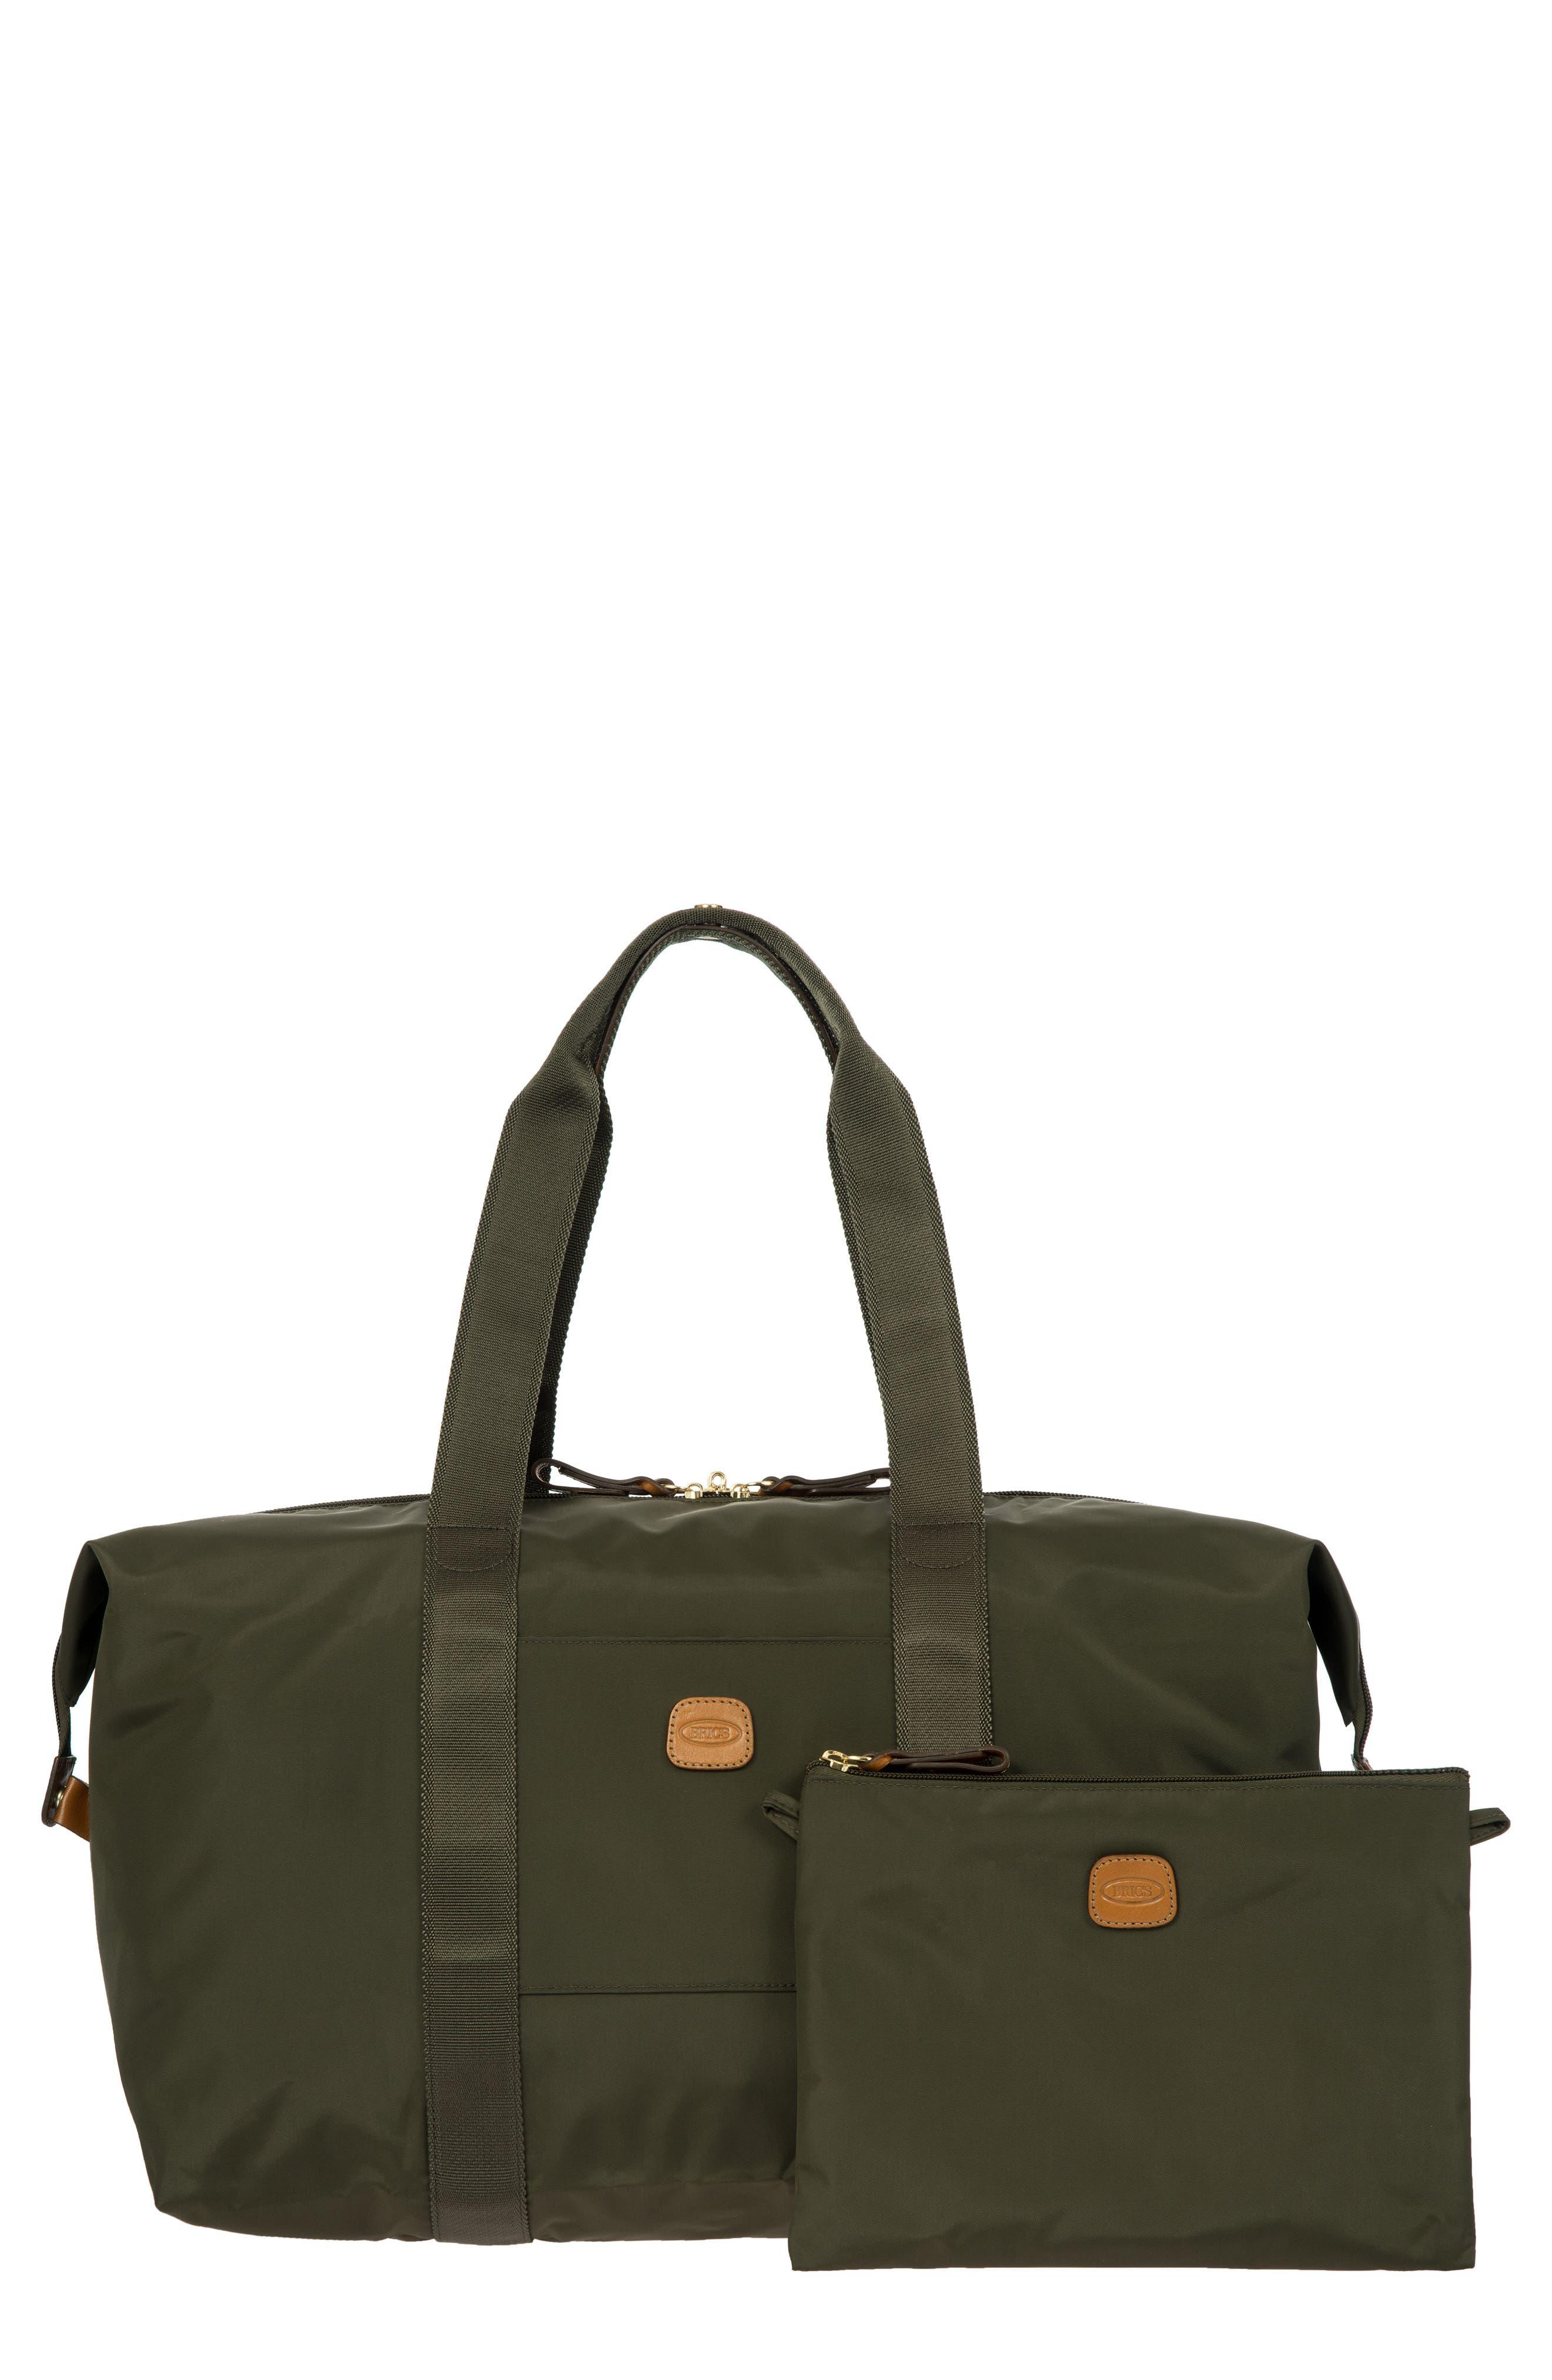 Main Image - Bric's X-Bag 18-Inch Folding Duffel Bag